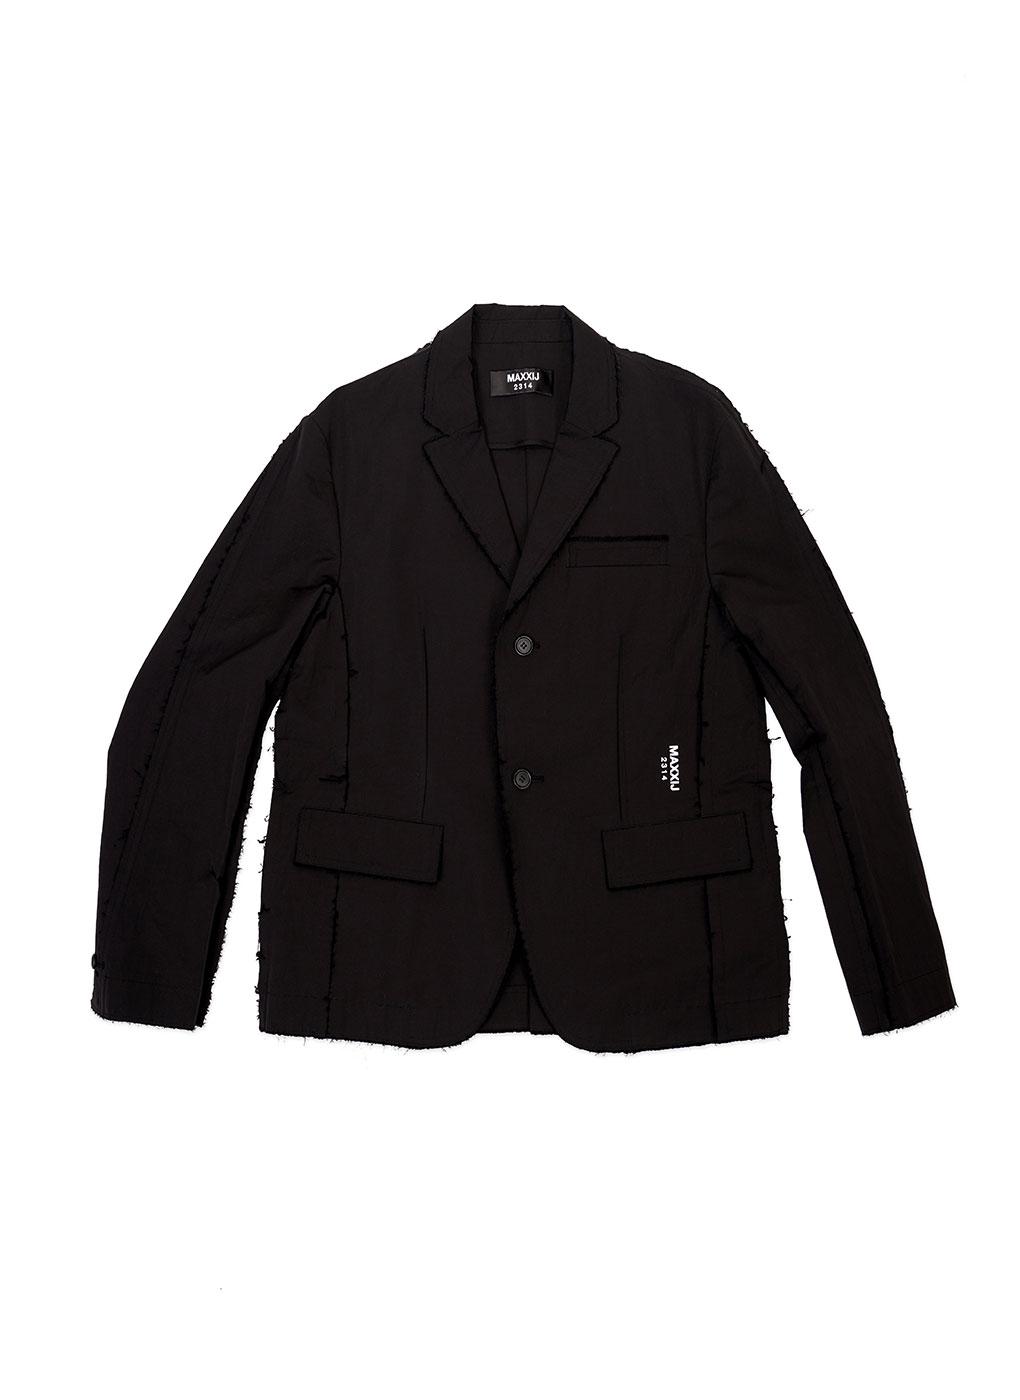 Black Cotton Nylon Insideout Seam Binding Blazer